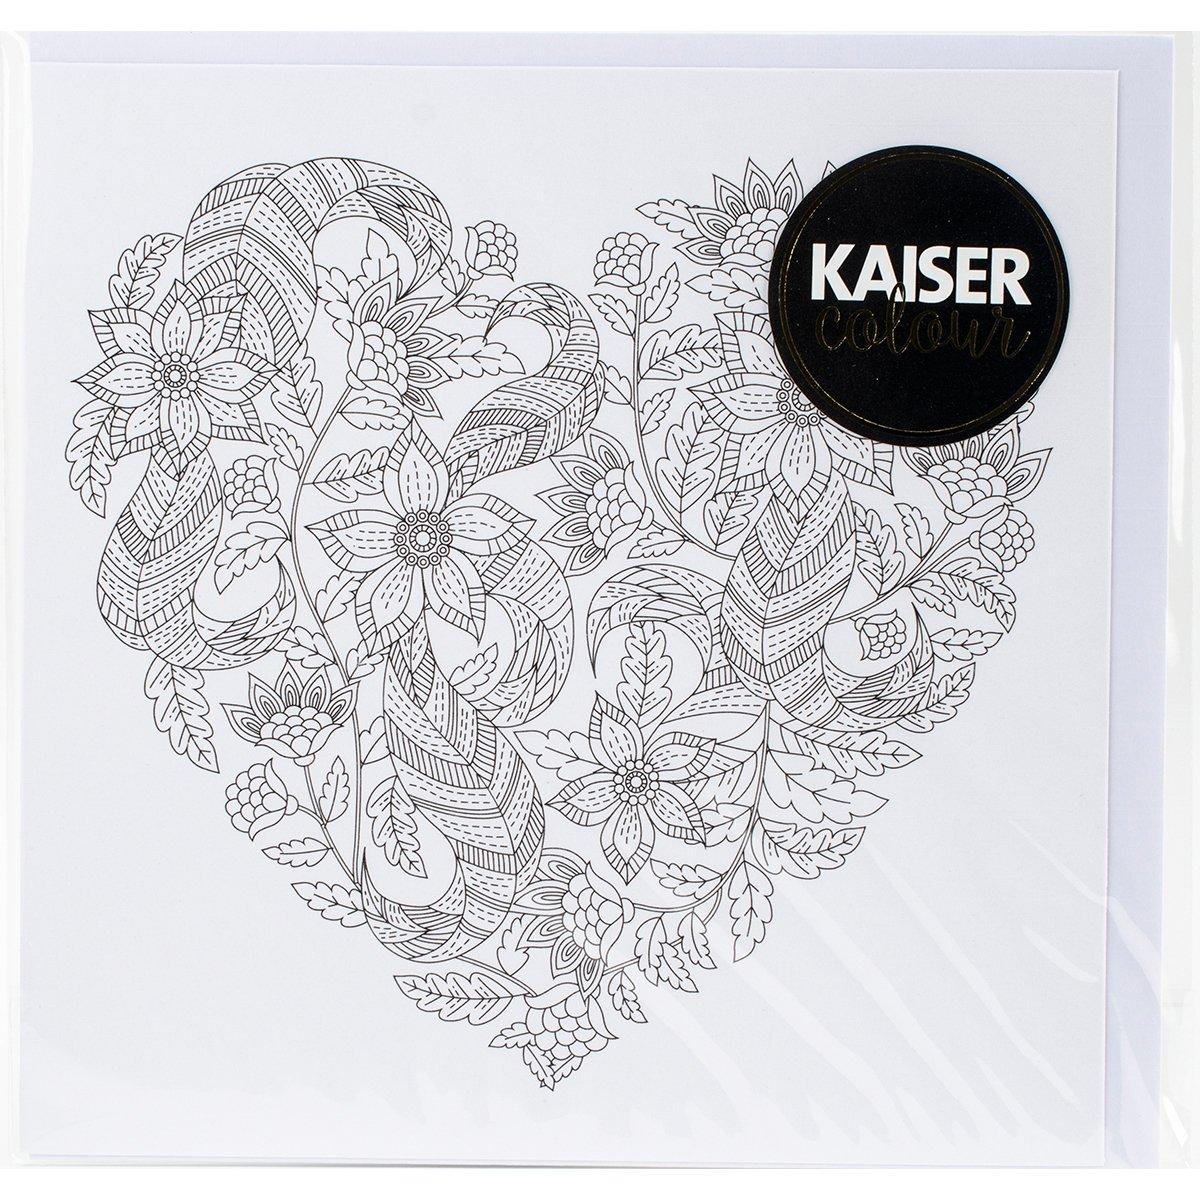 Kaisercraft Floral Heart Kaisercolour Gift Card with Envelope, 6 x 6 6 x 6 CL1003